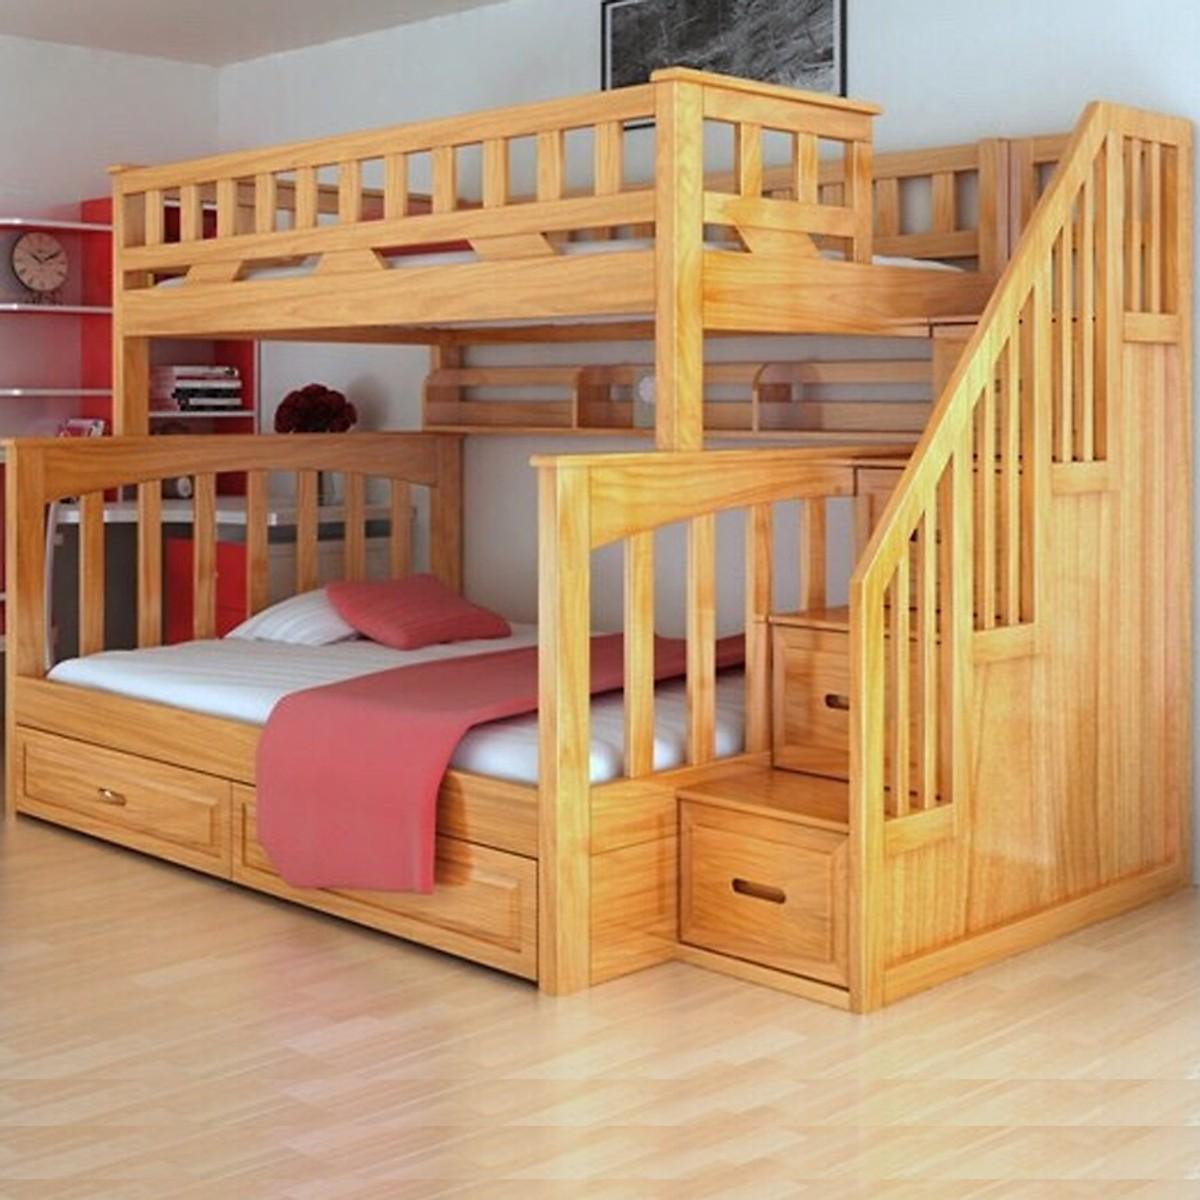 Giường Tầng Cao Cấp Ohaha-007